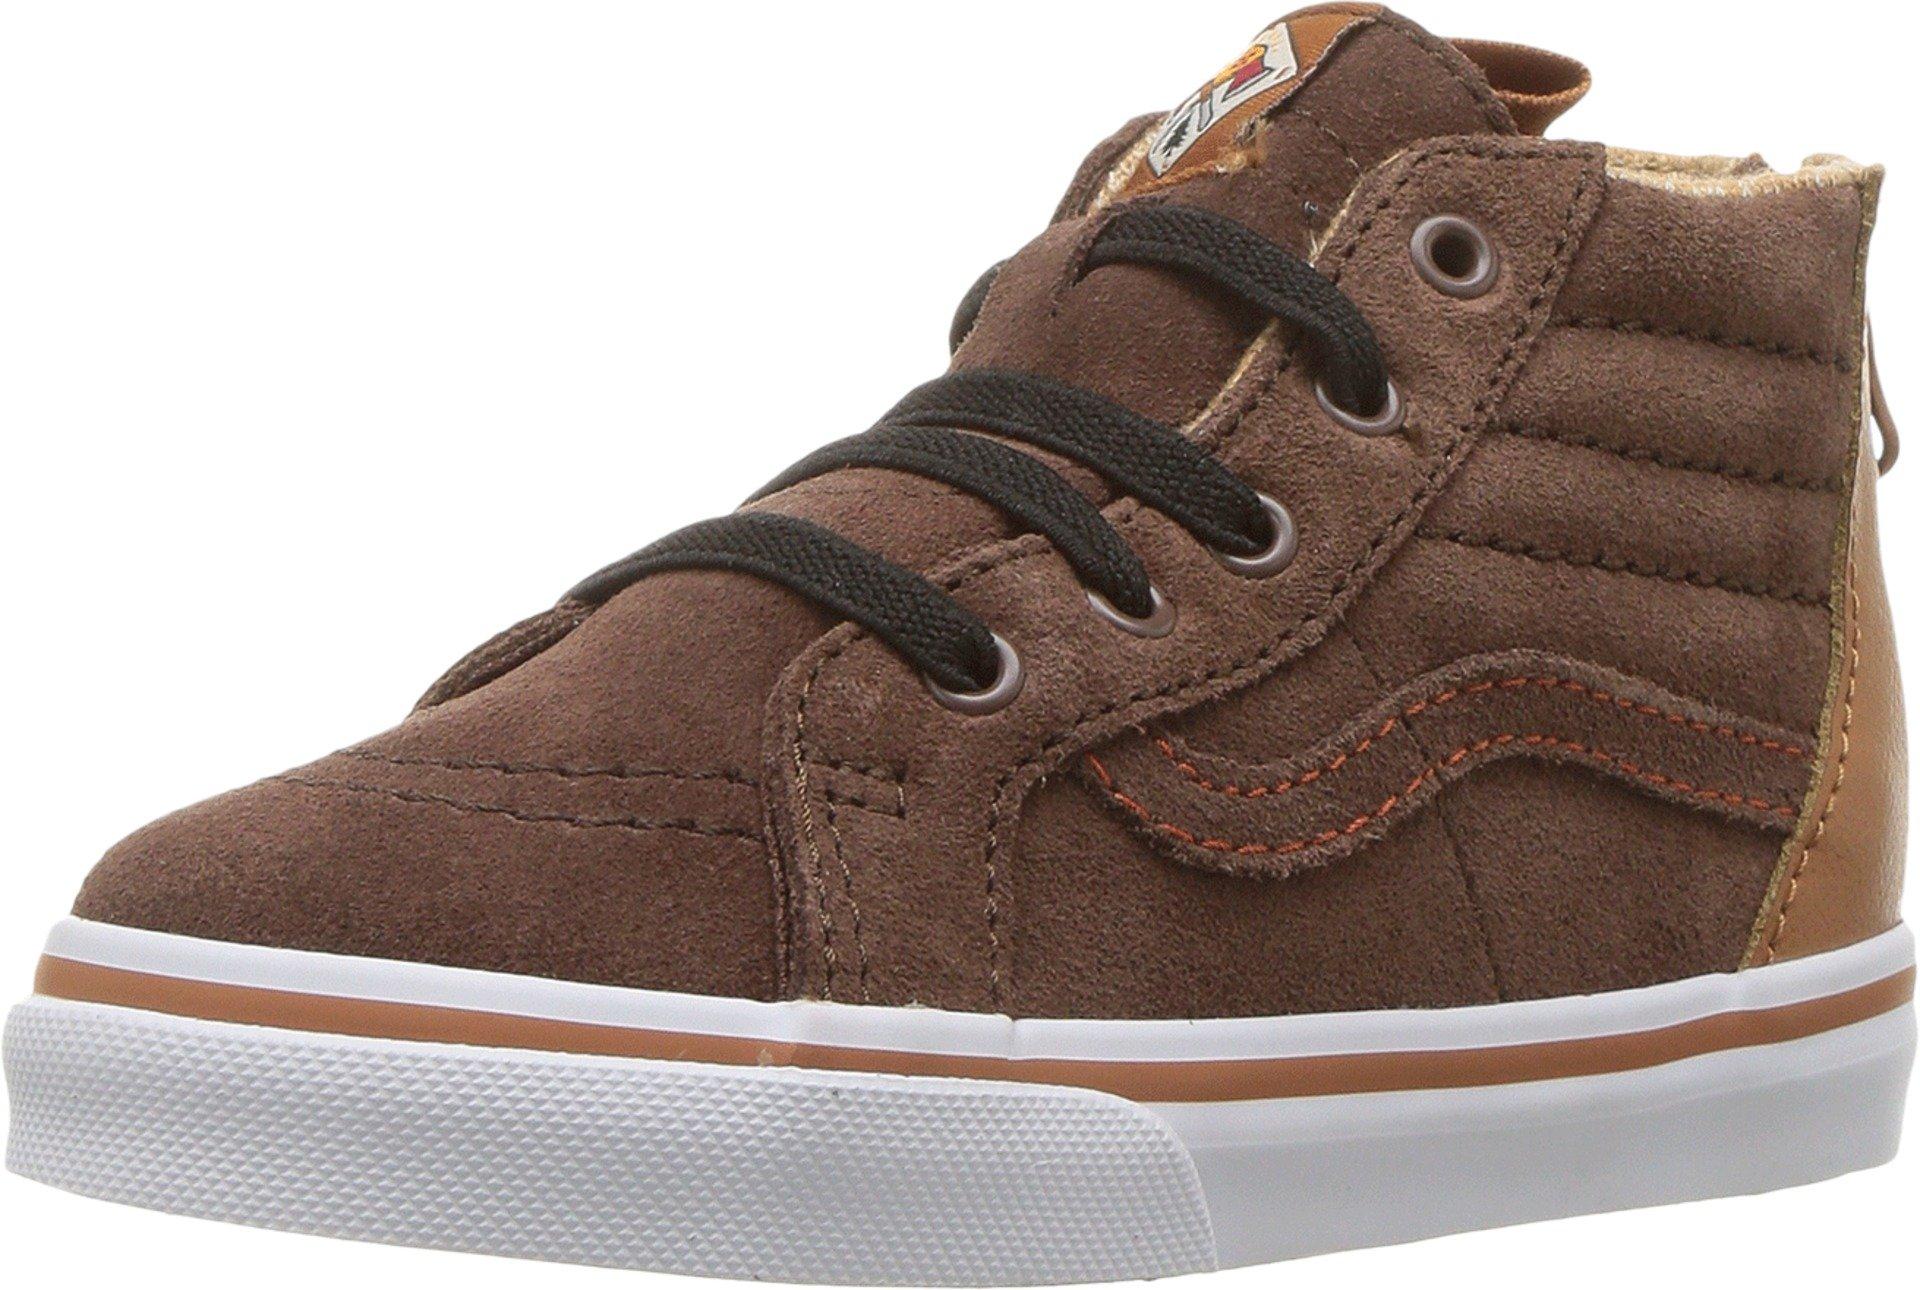 Vans Infant/Toddler Shoes SK8-Hi Top Zip Suede Brown (MTE) Potting Soil Fashion Sneakers (7 Toddler M)